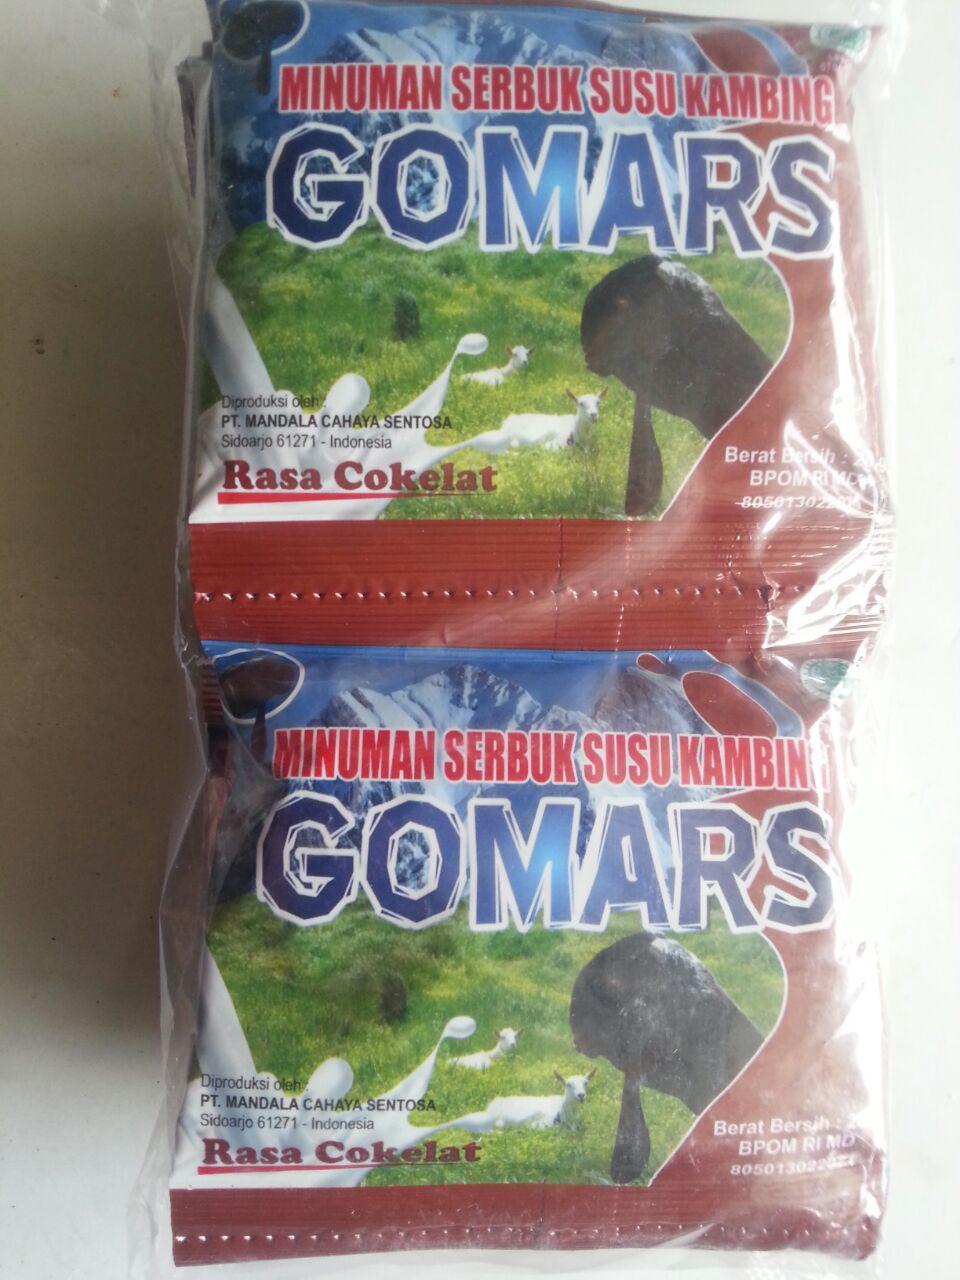 Minuman Serbuk Susu Kambing Gomars Rasa Cokelat 10 Pcs cover